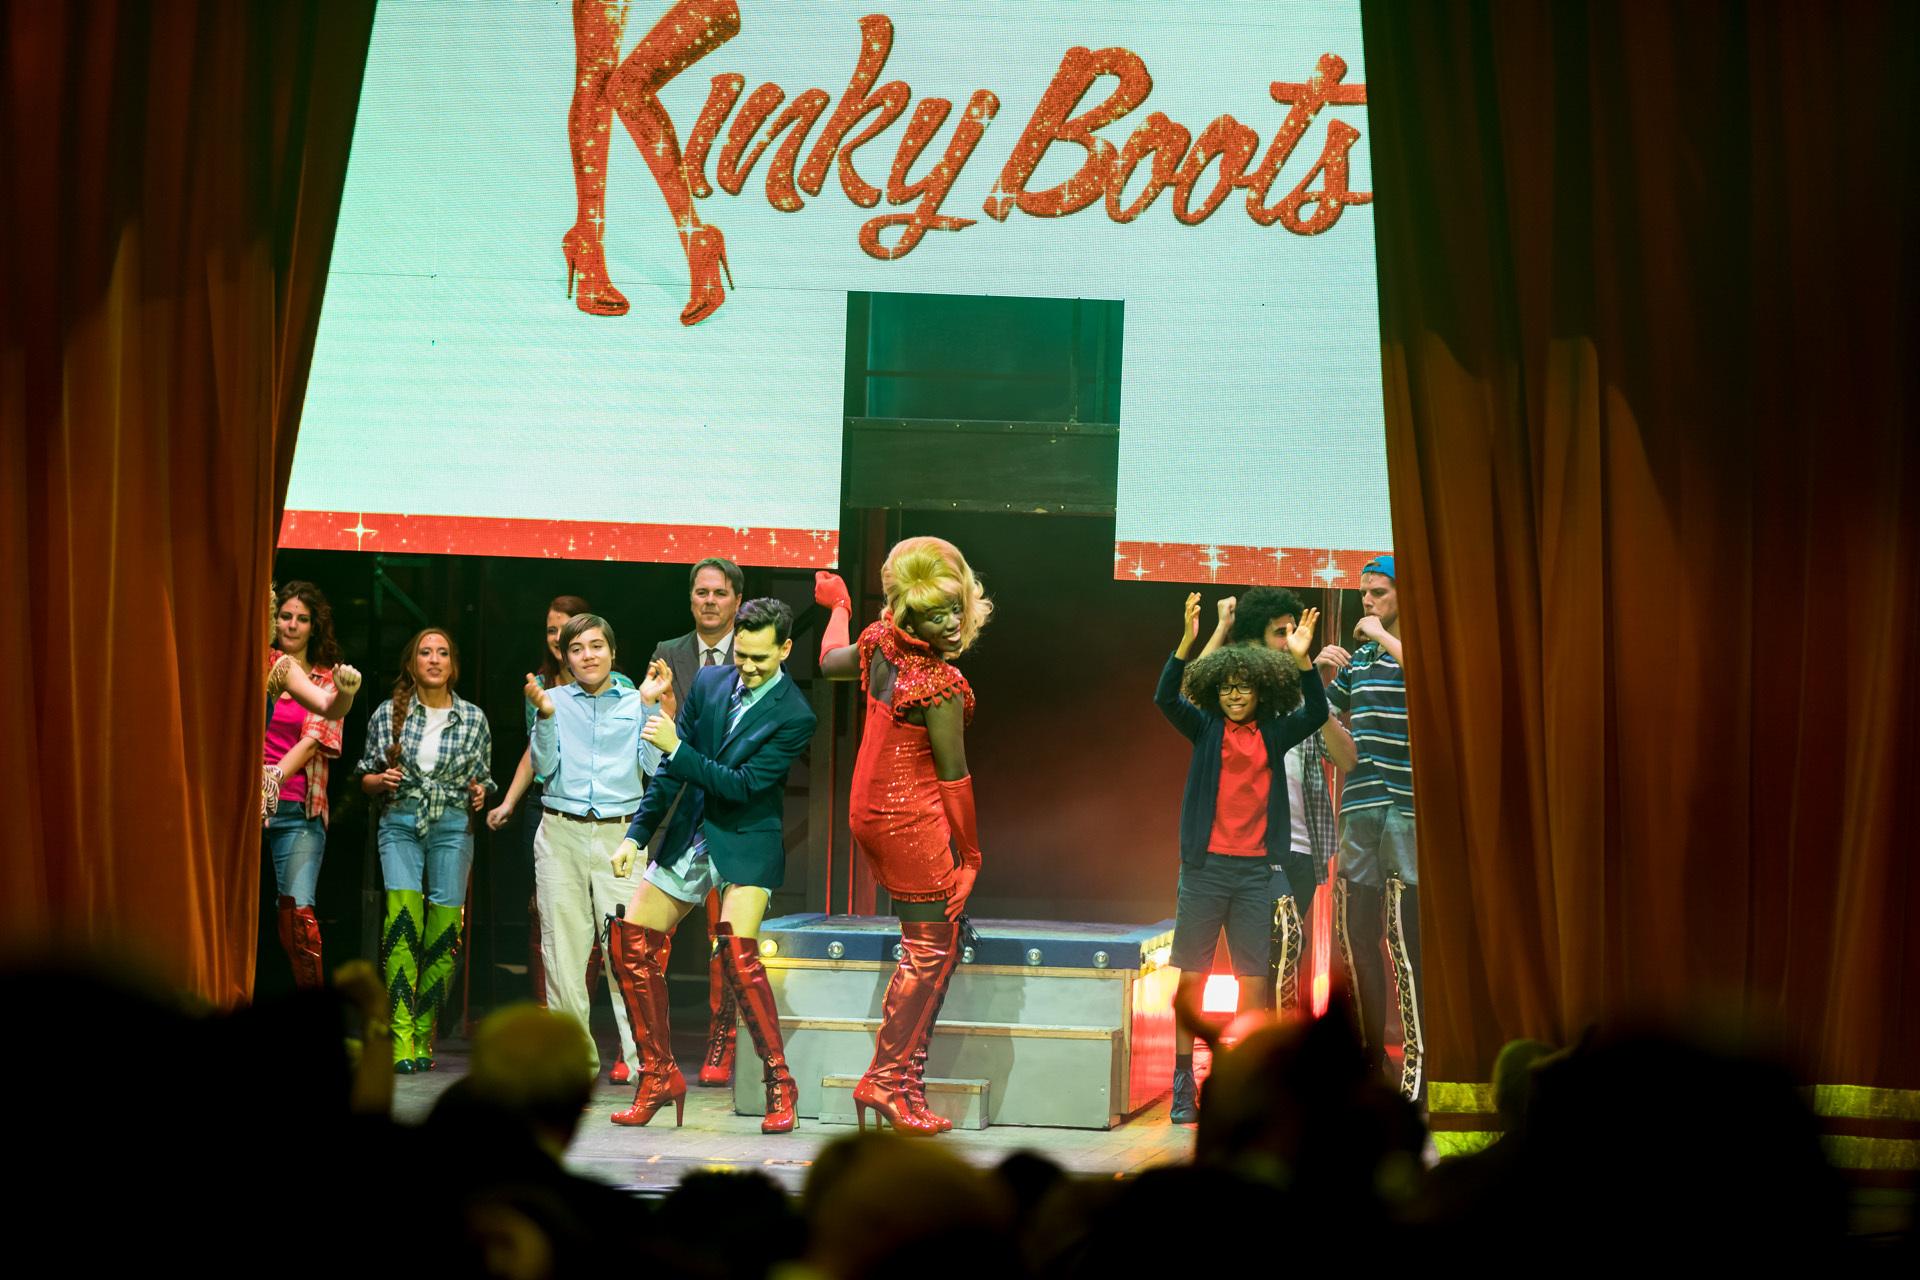 2018_11_30-©-LKV-Kinky-Boots-234100-5D4A5910